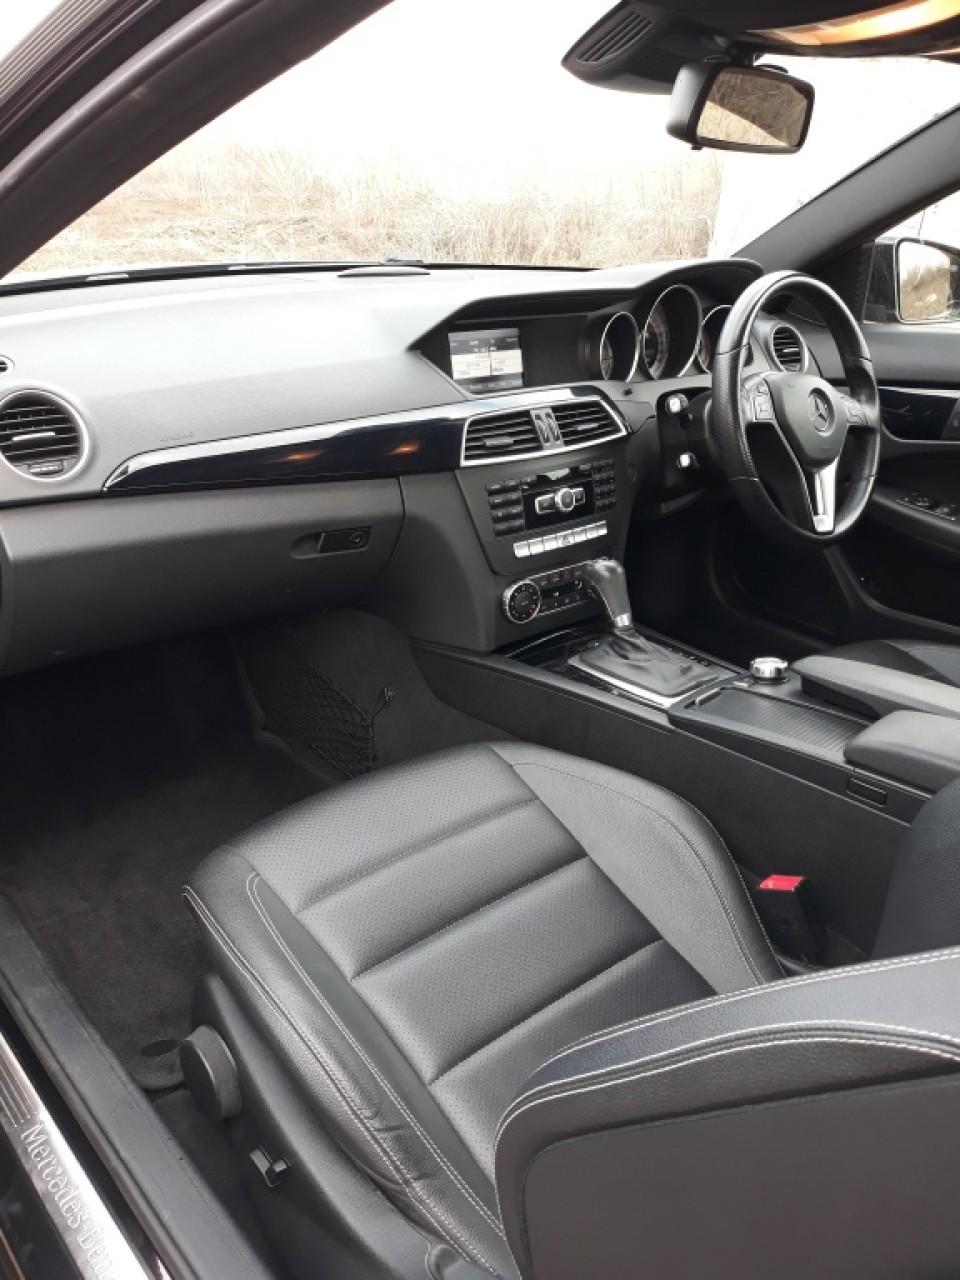 Sonda lambda Mercedes C-CLASS W204 2013 coupe 2.2